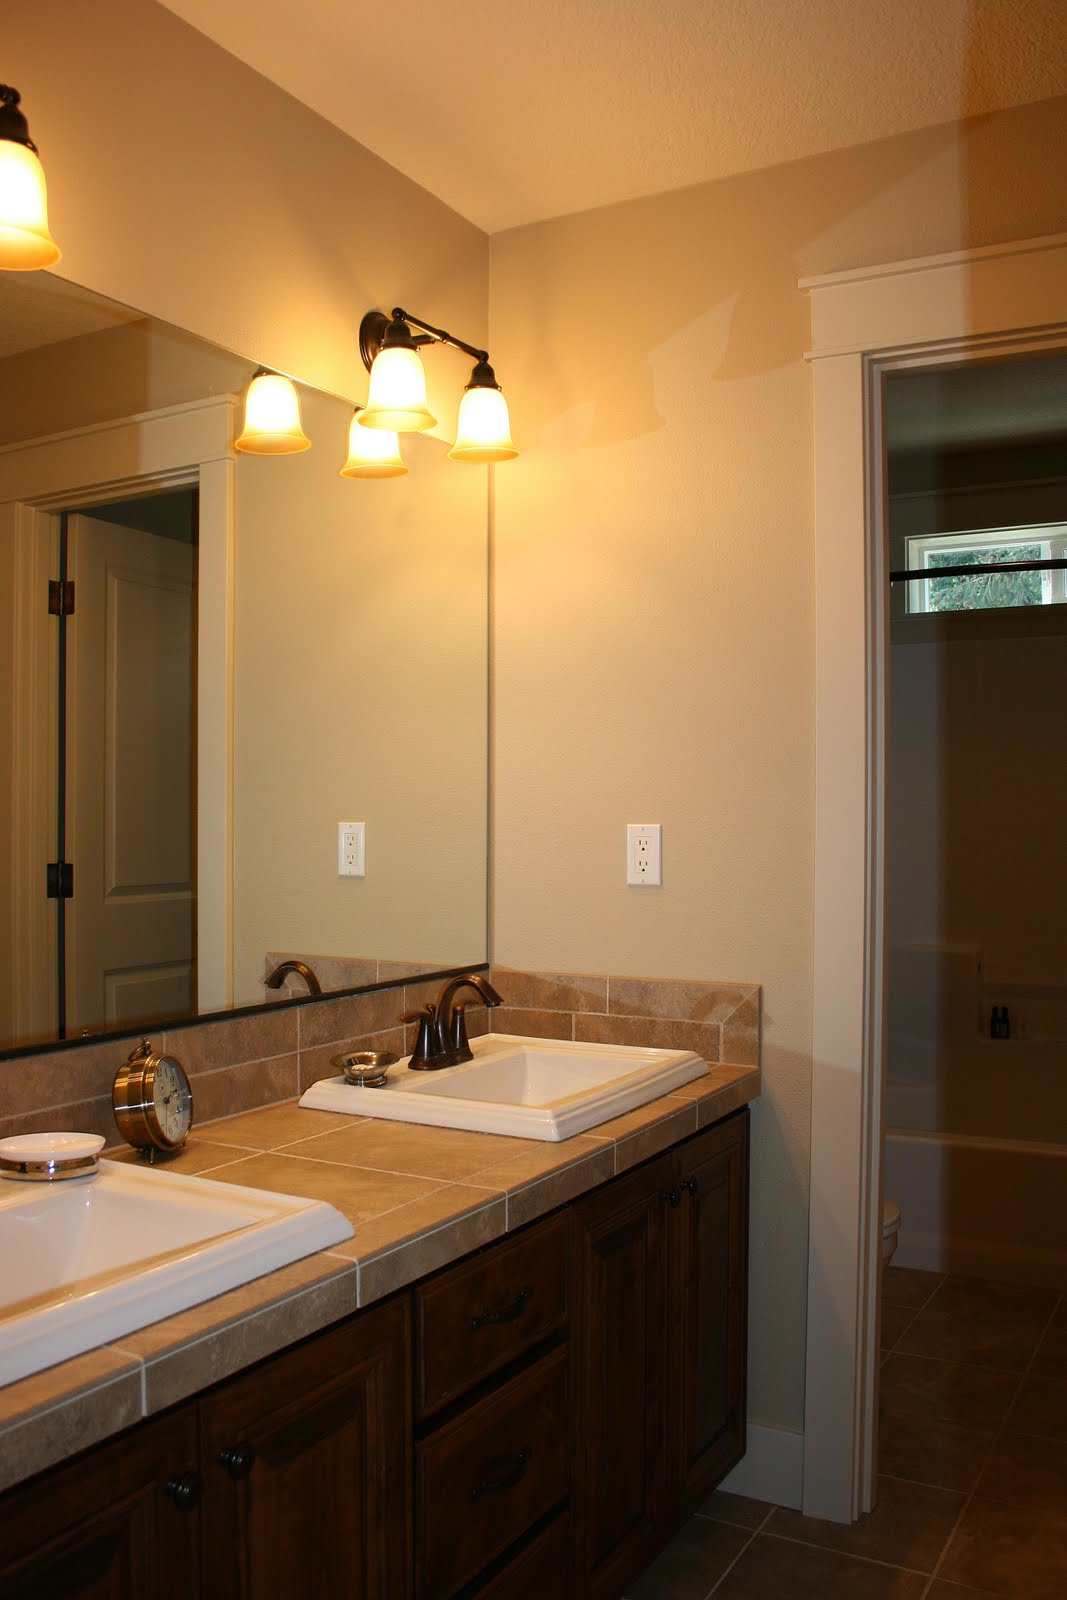 Astounding Bathroom Vanity Light Bar Height Fixture Dou For in dimensions 1067 X 1600